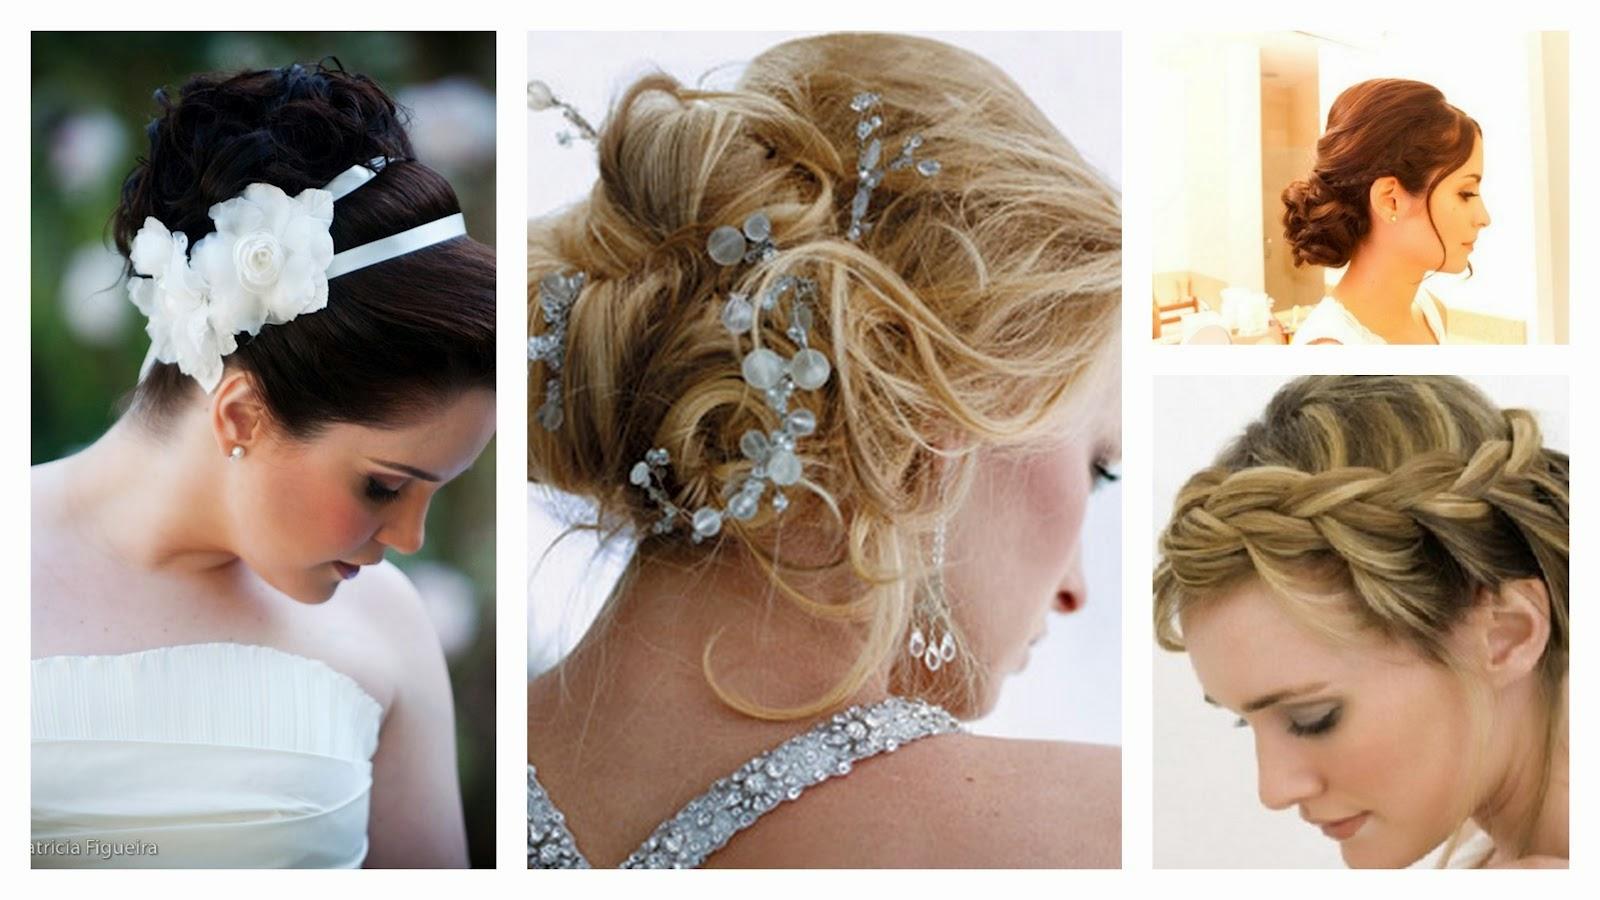 penteados-para-casamento-noivas-cabelos-presos-4